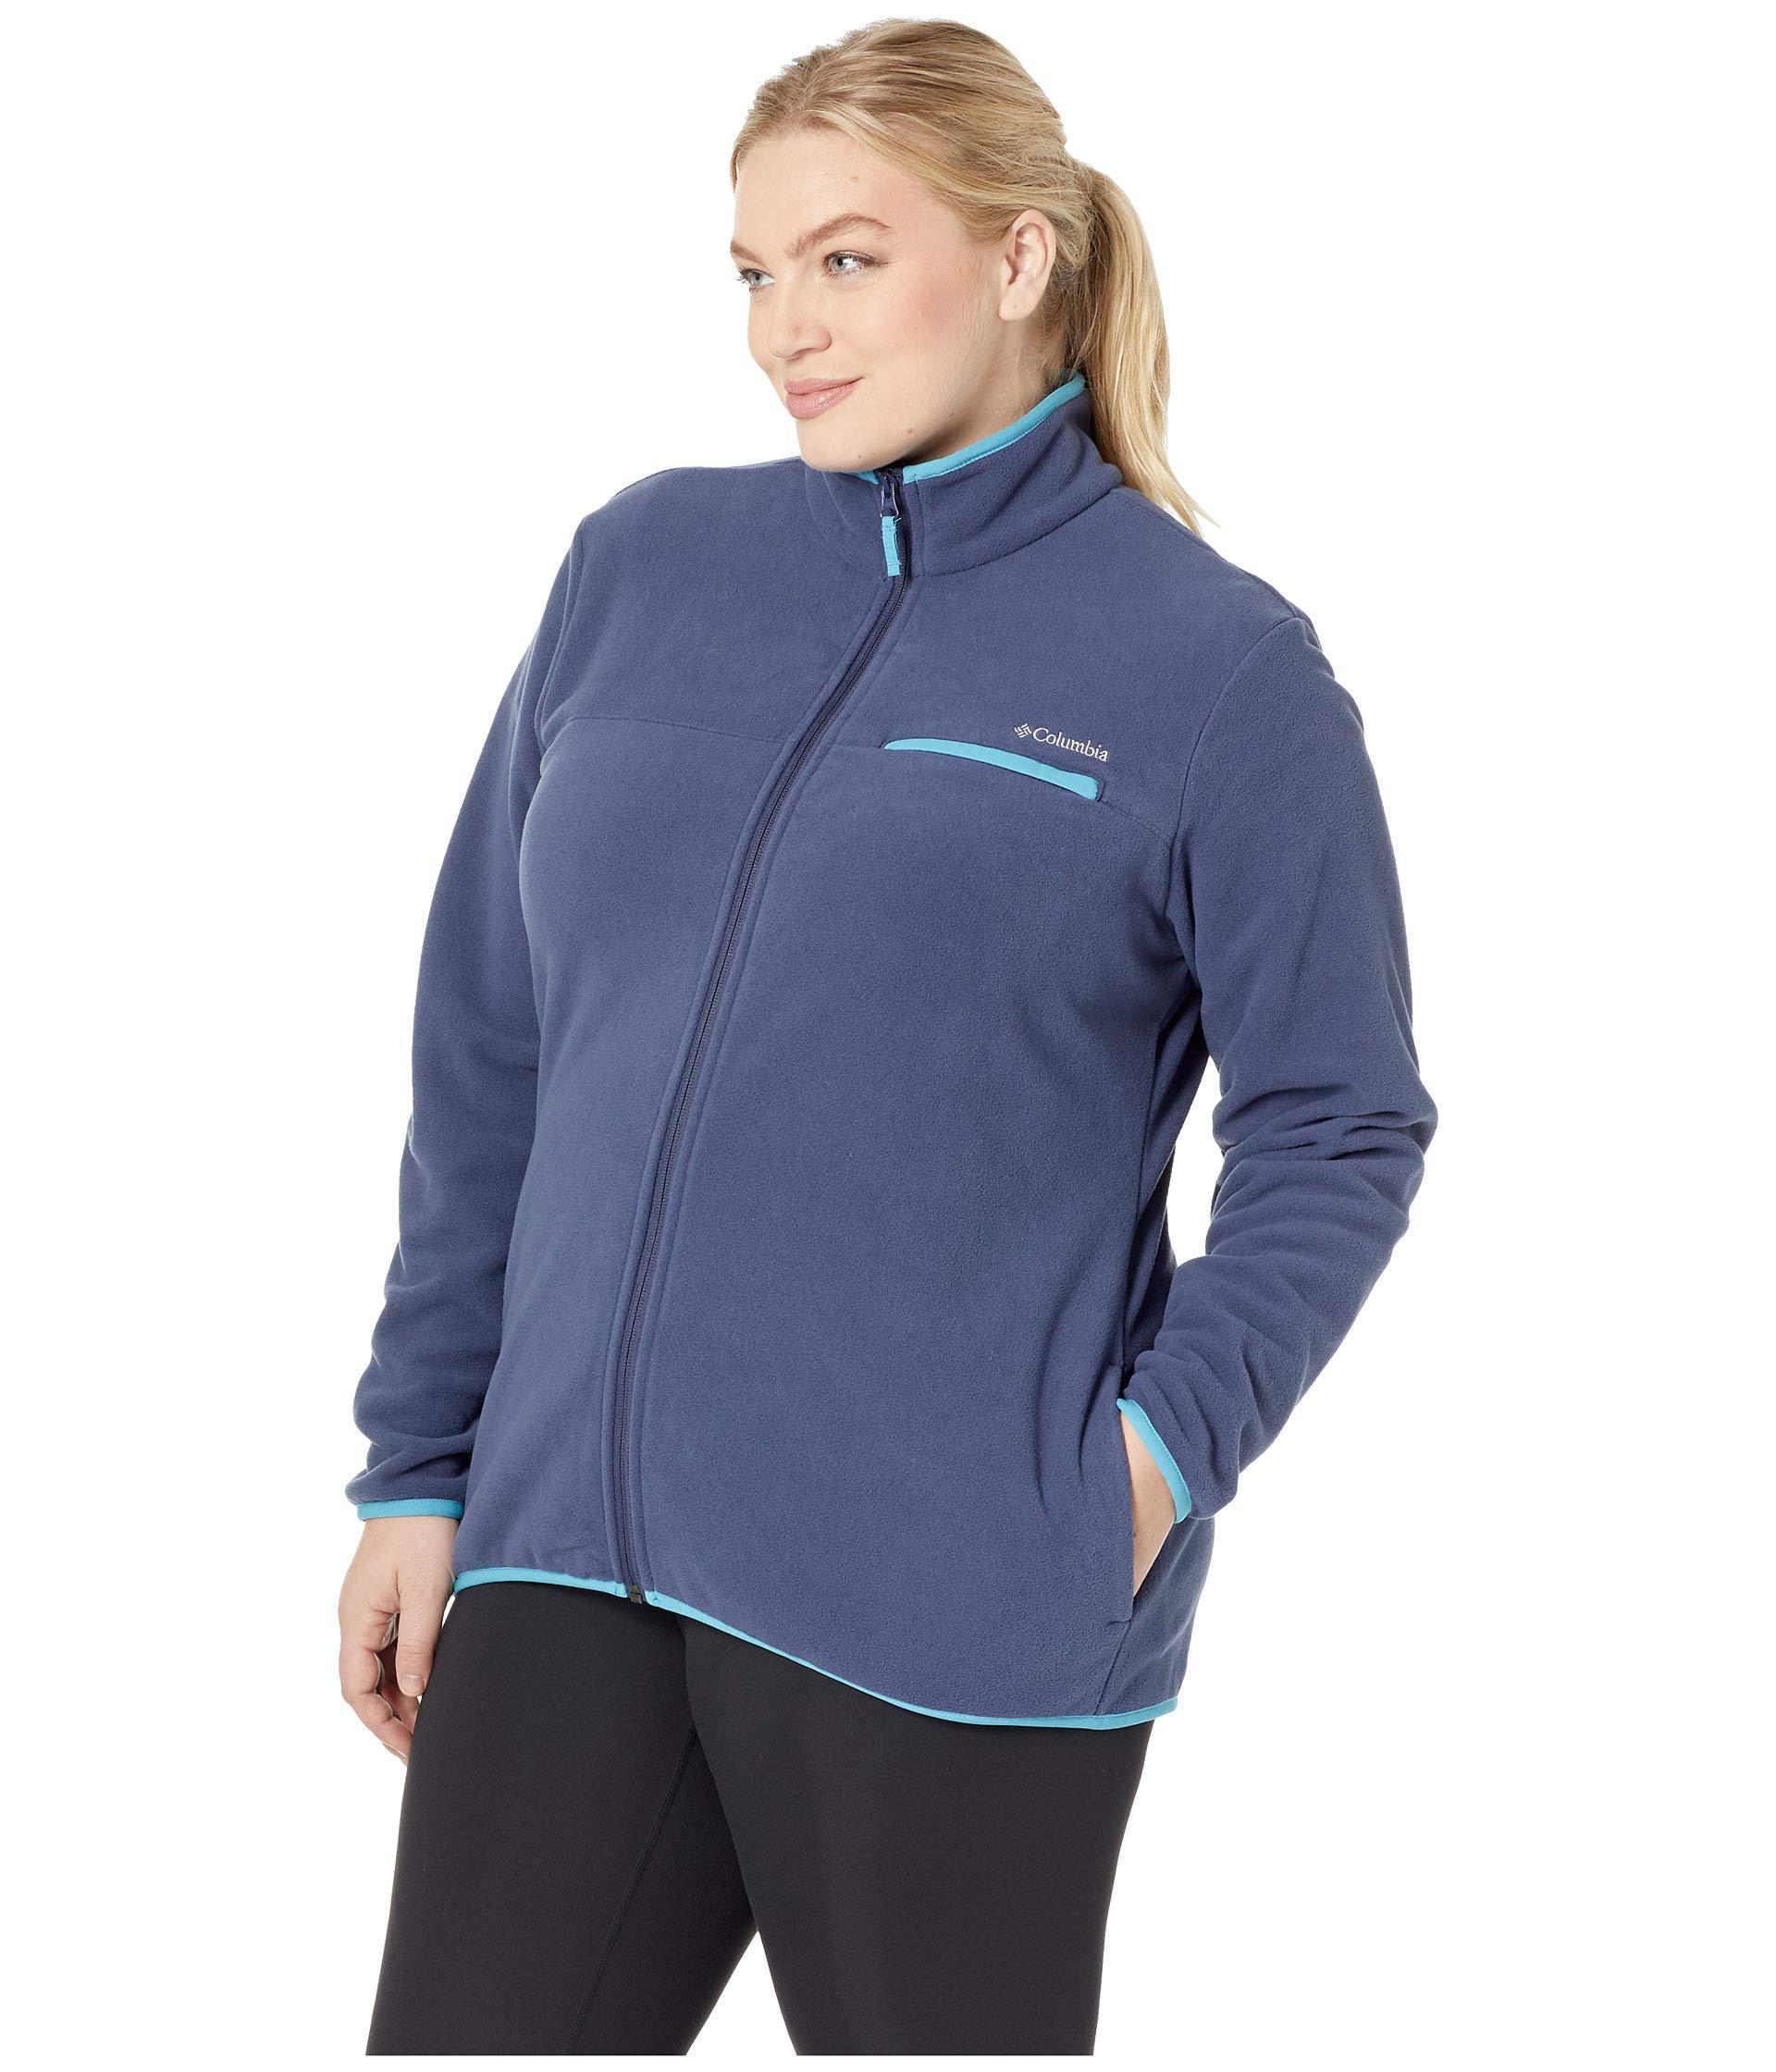 NWT Columbia Women/'s Mountain Crest Full Zip Fleece Size Large $50 4 COLORS